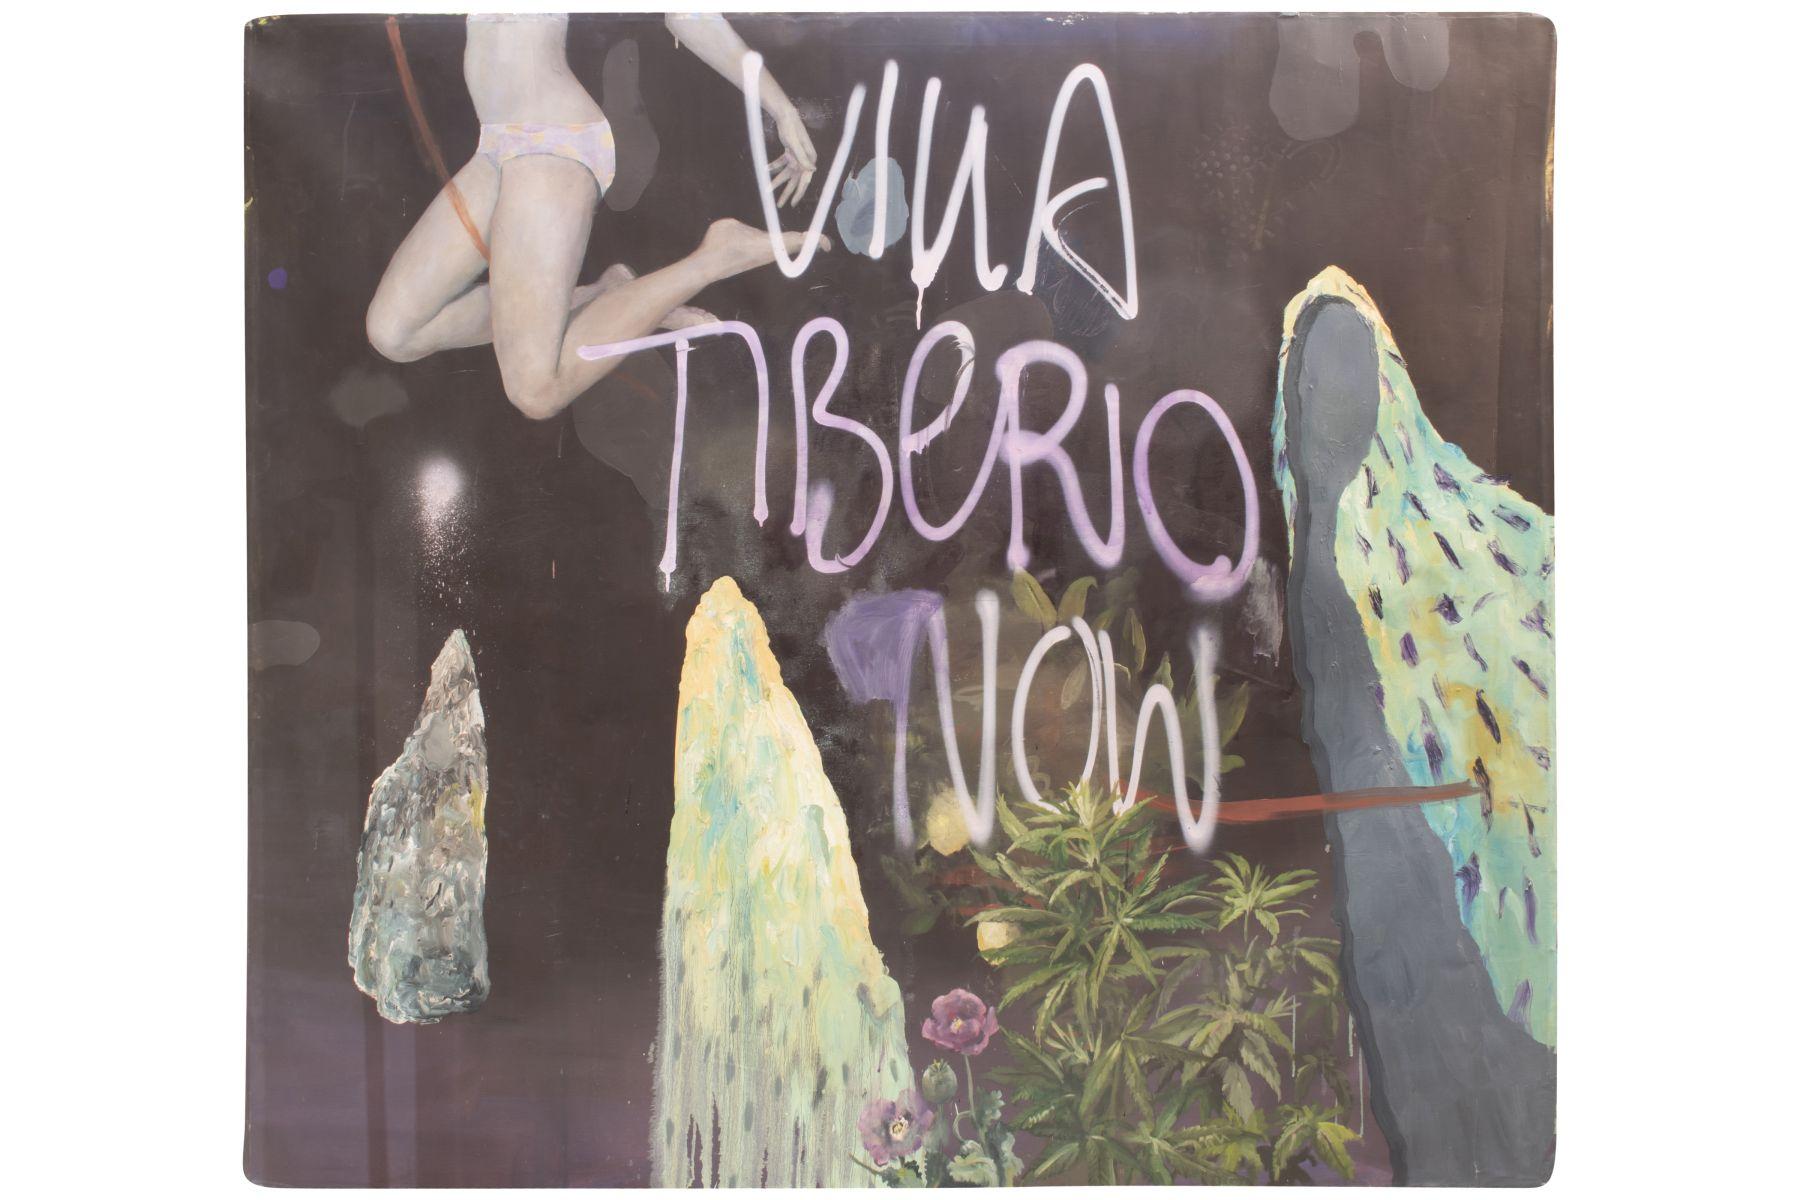 "#70 Philip Müller (1988) ""Viva Tibero now"" 2016 | Philip Müller (1988) ""Viva Tibero now"" 2016 Image"